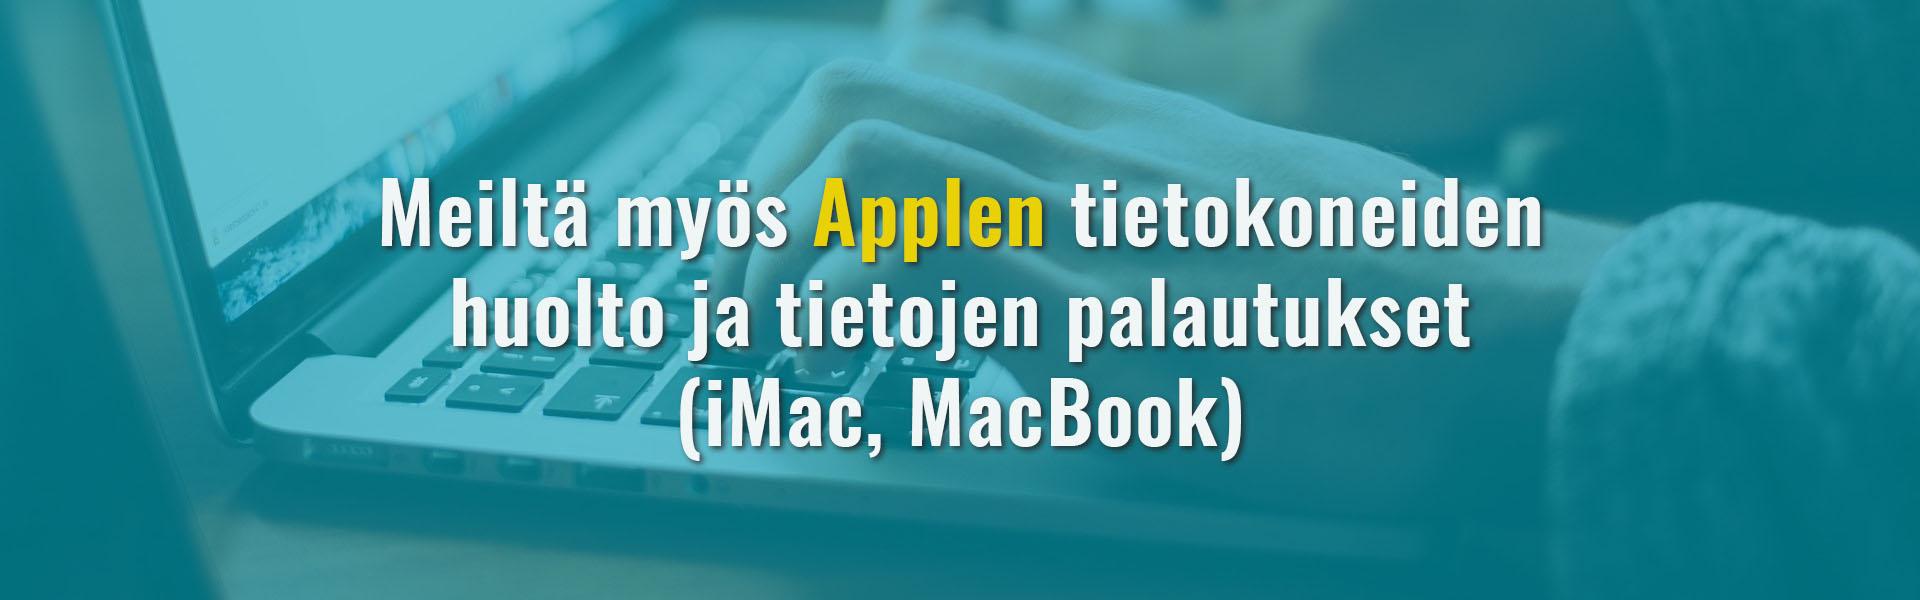 Mac-tietokoneiden huolto Tampereella